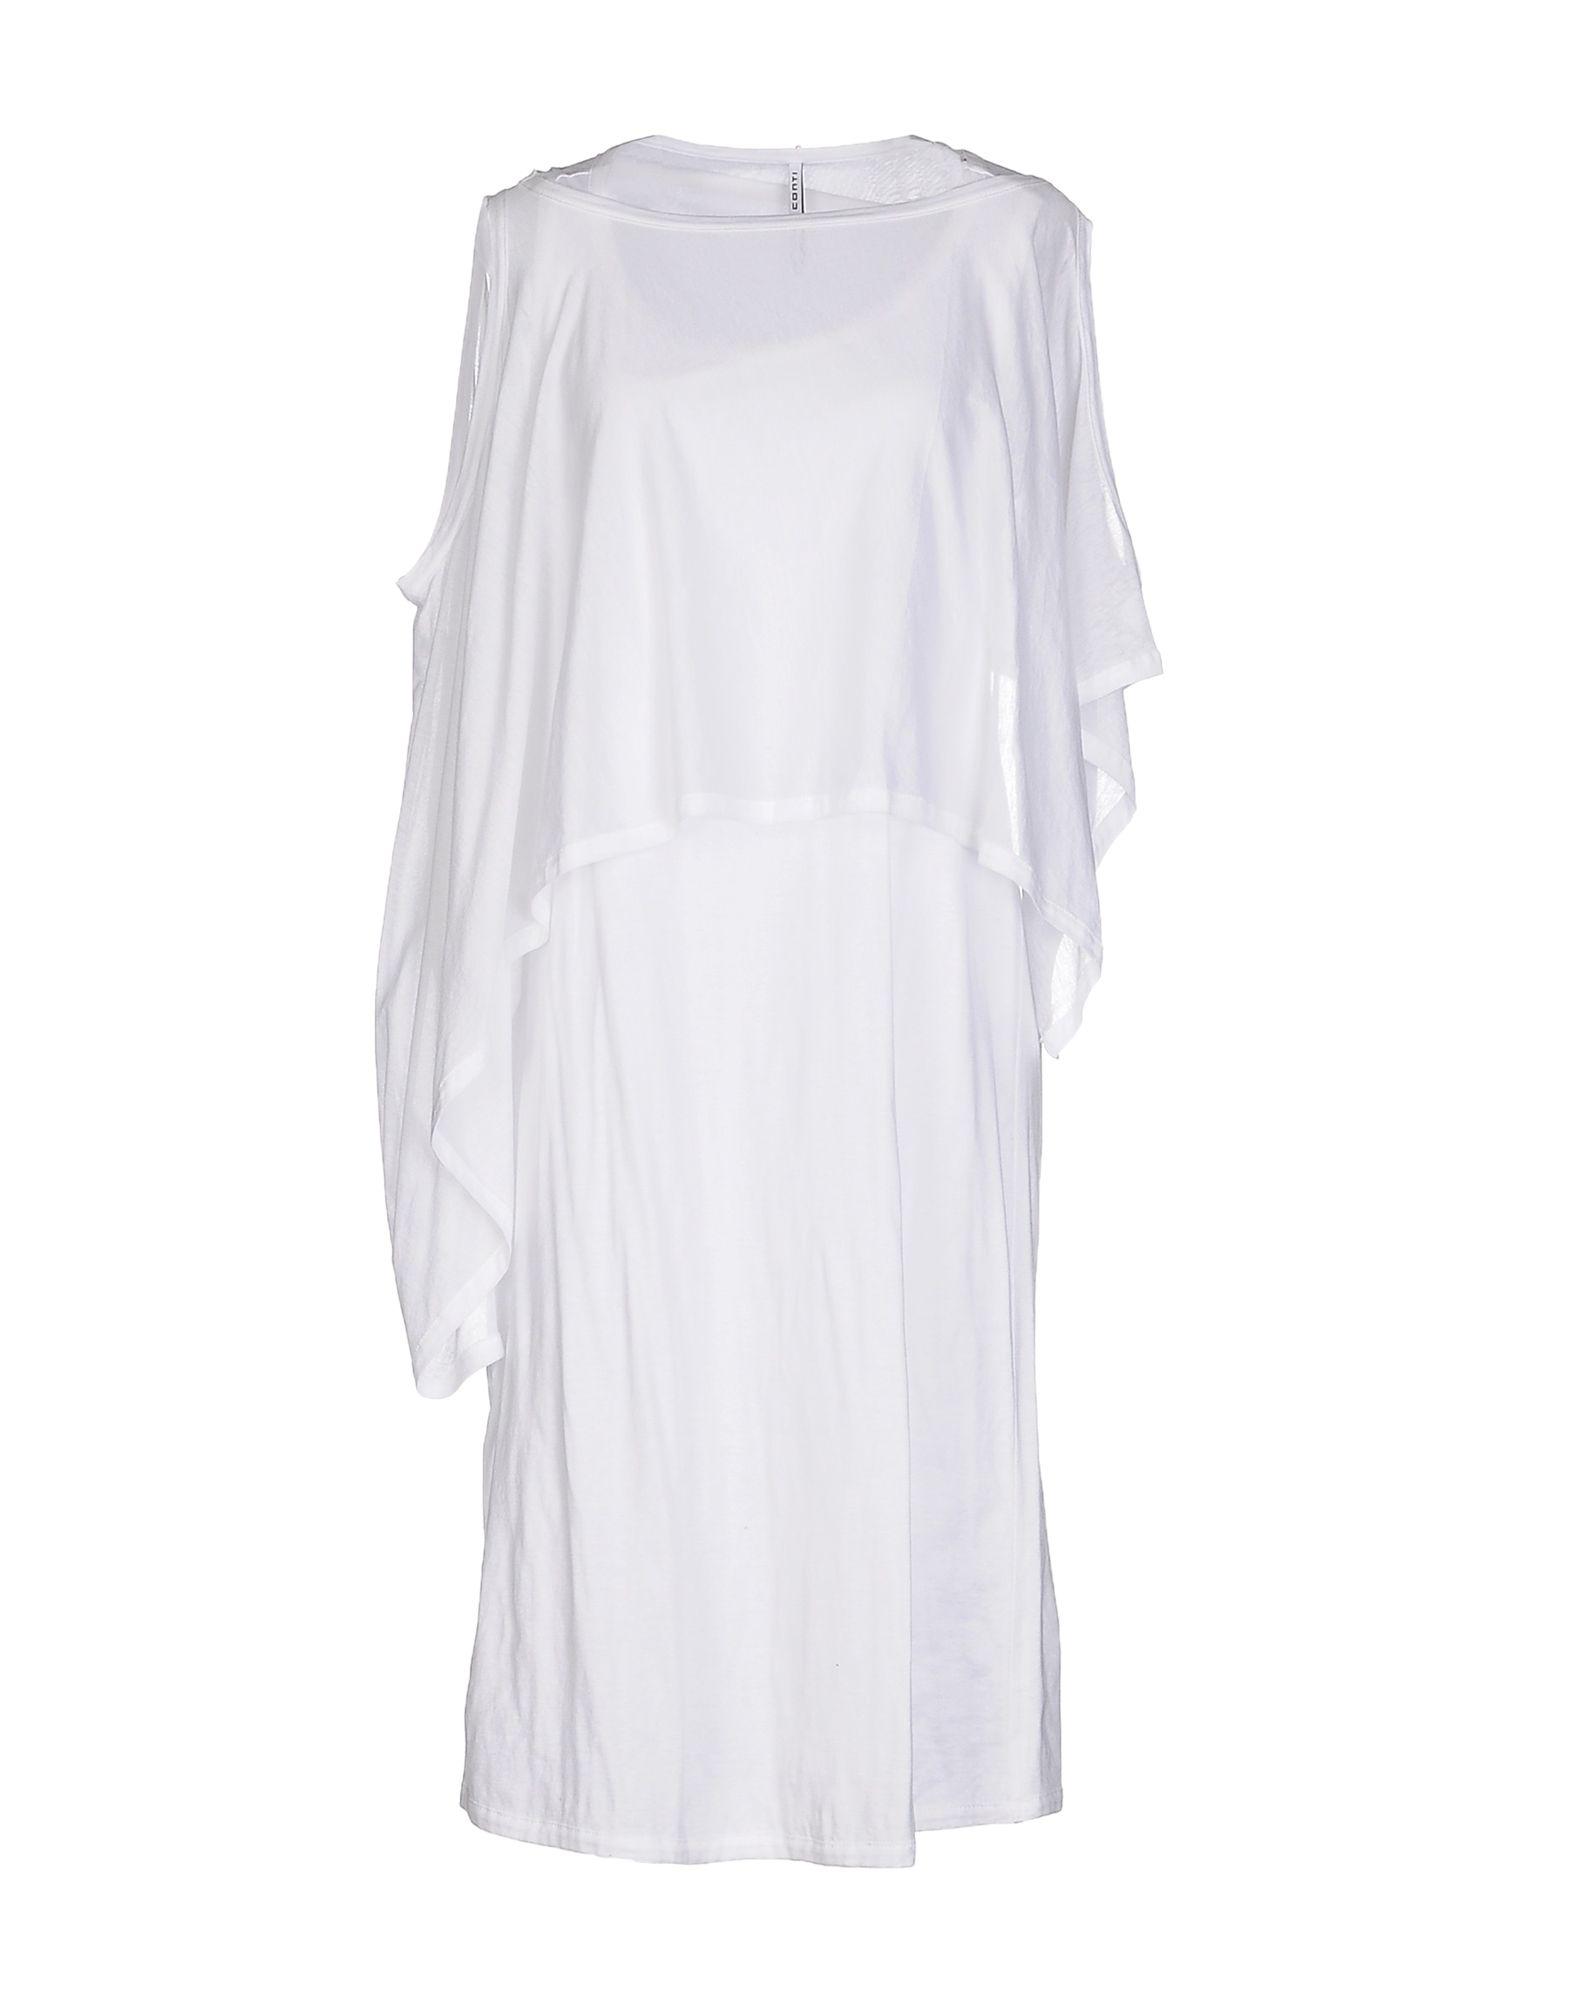 купить LIVIANA CONTI Платье до колена дешево